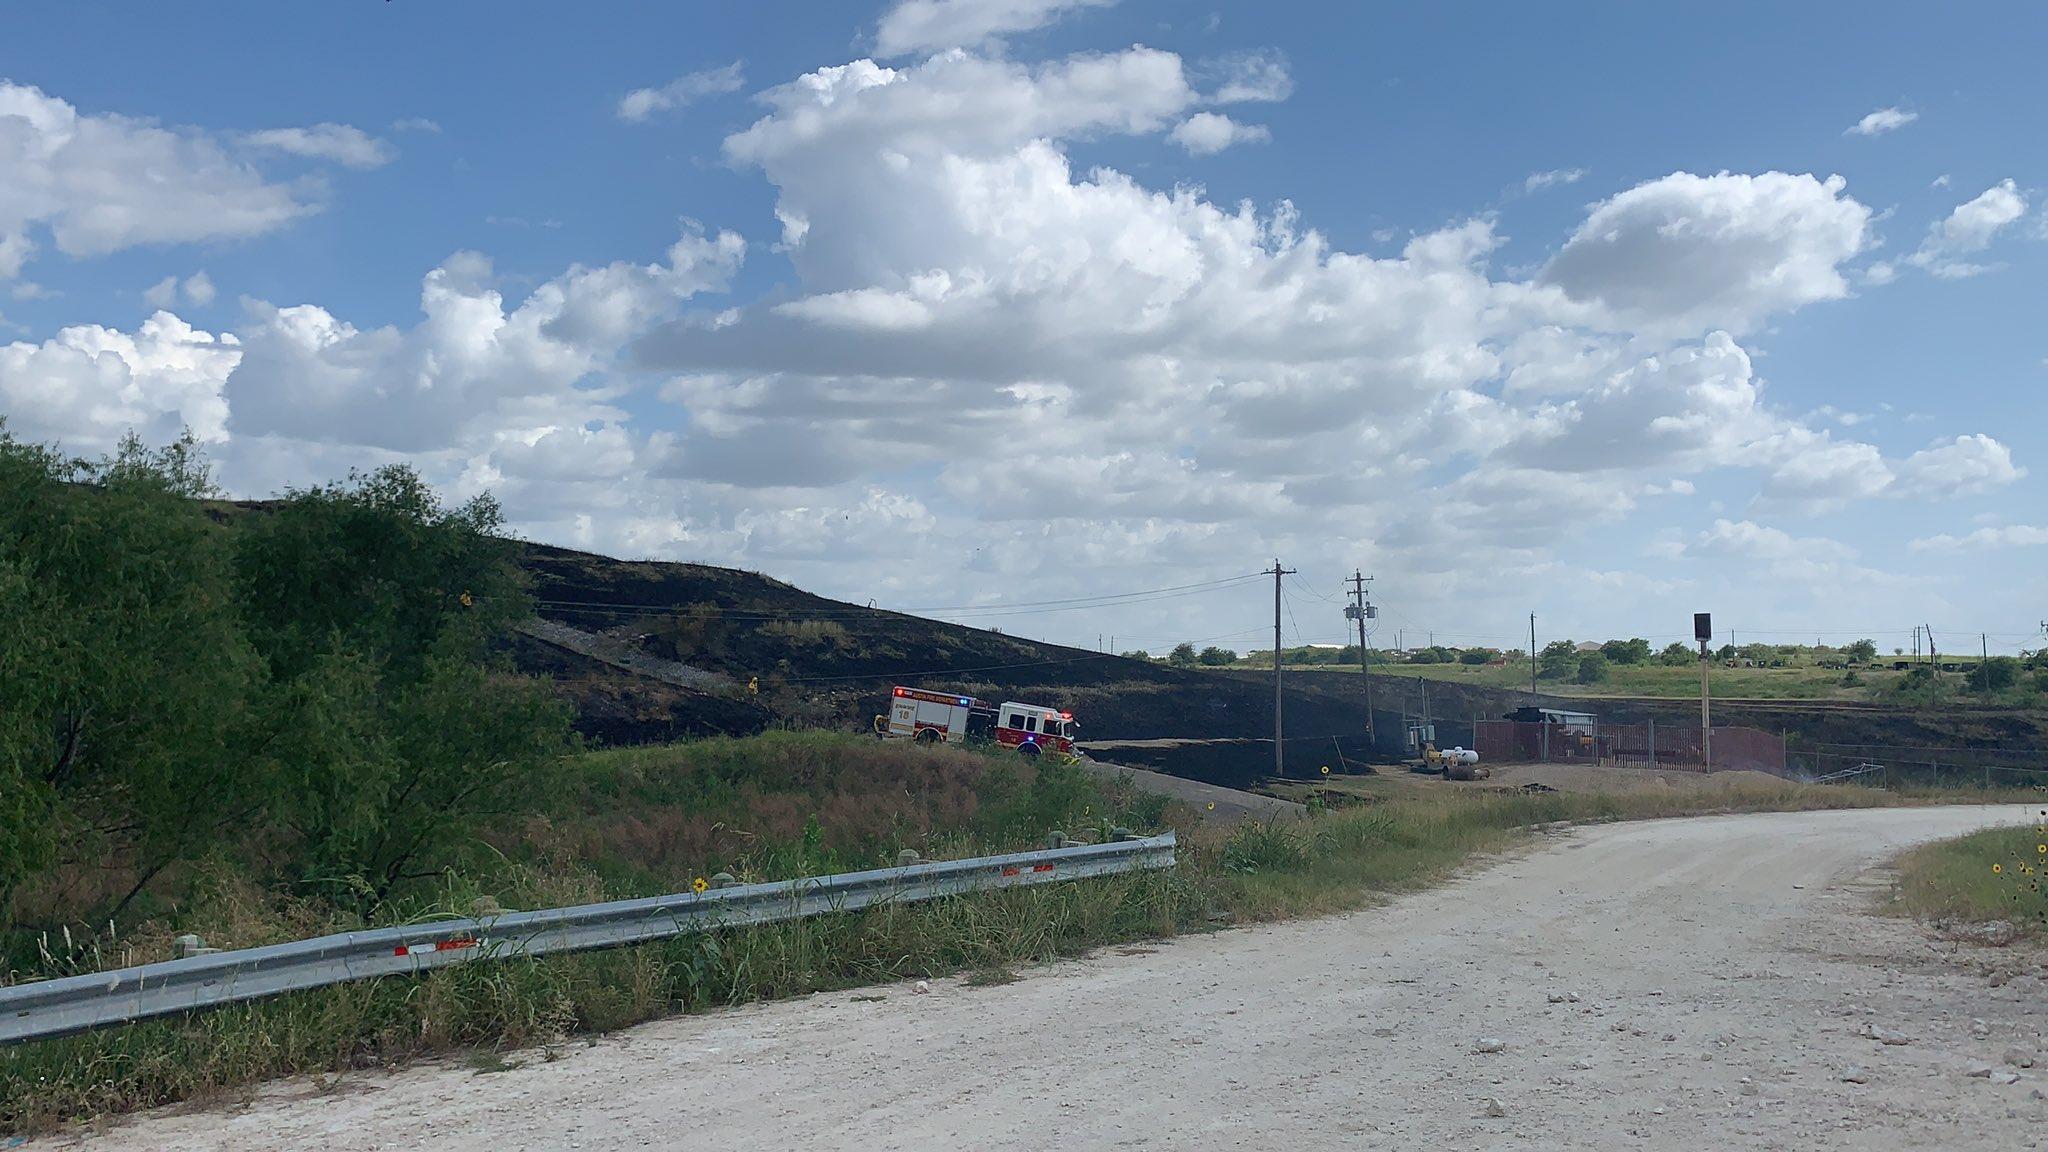 Brush fire landfill 7-19-20